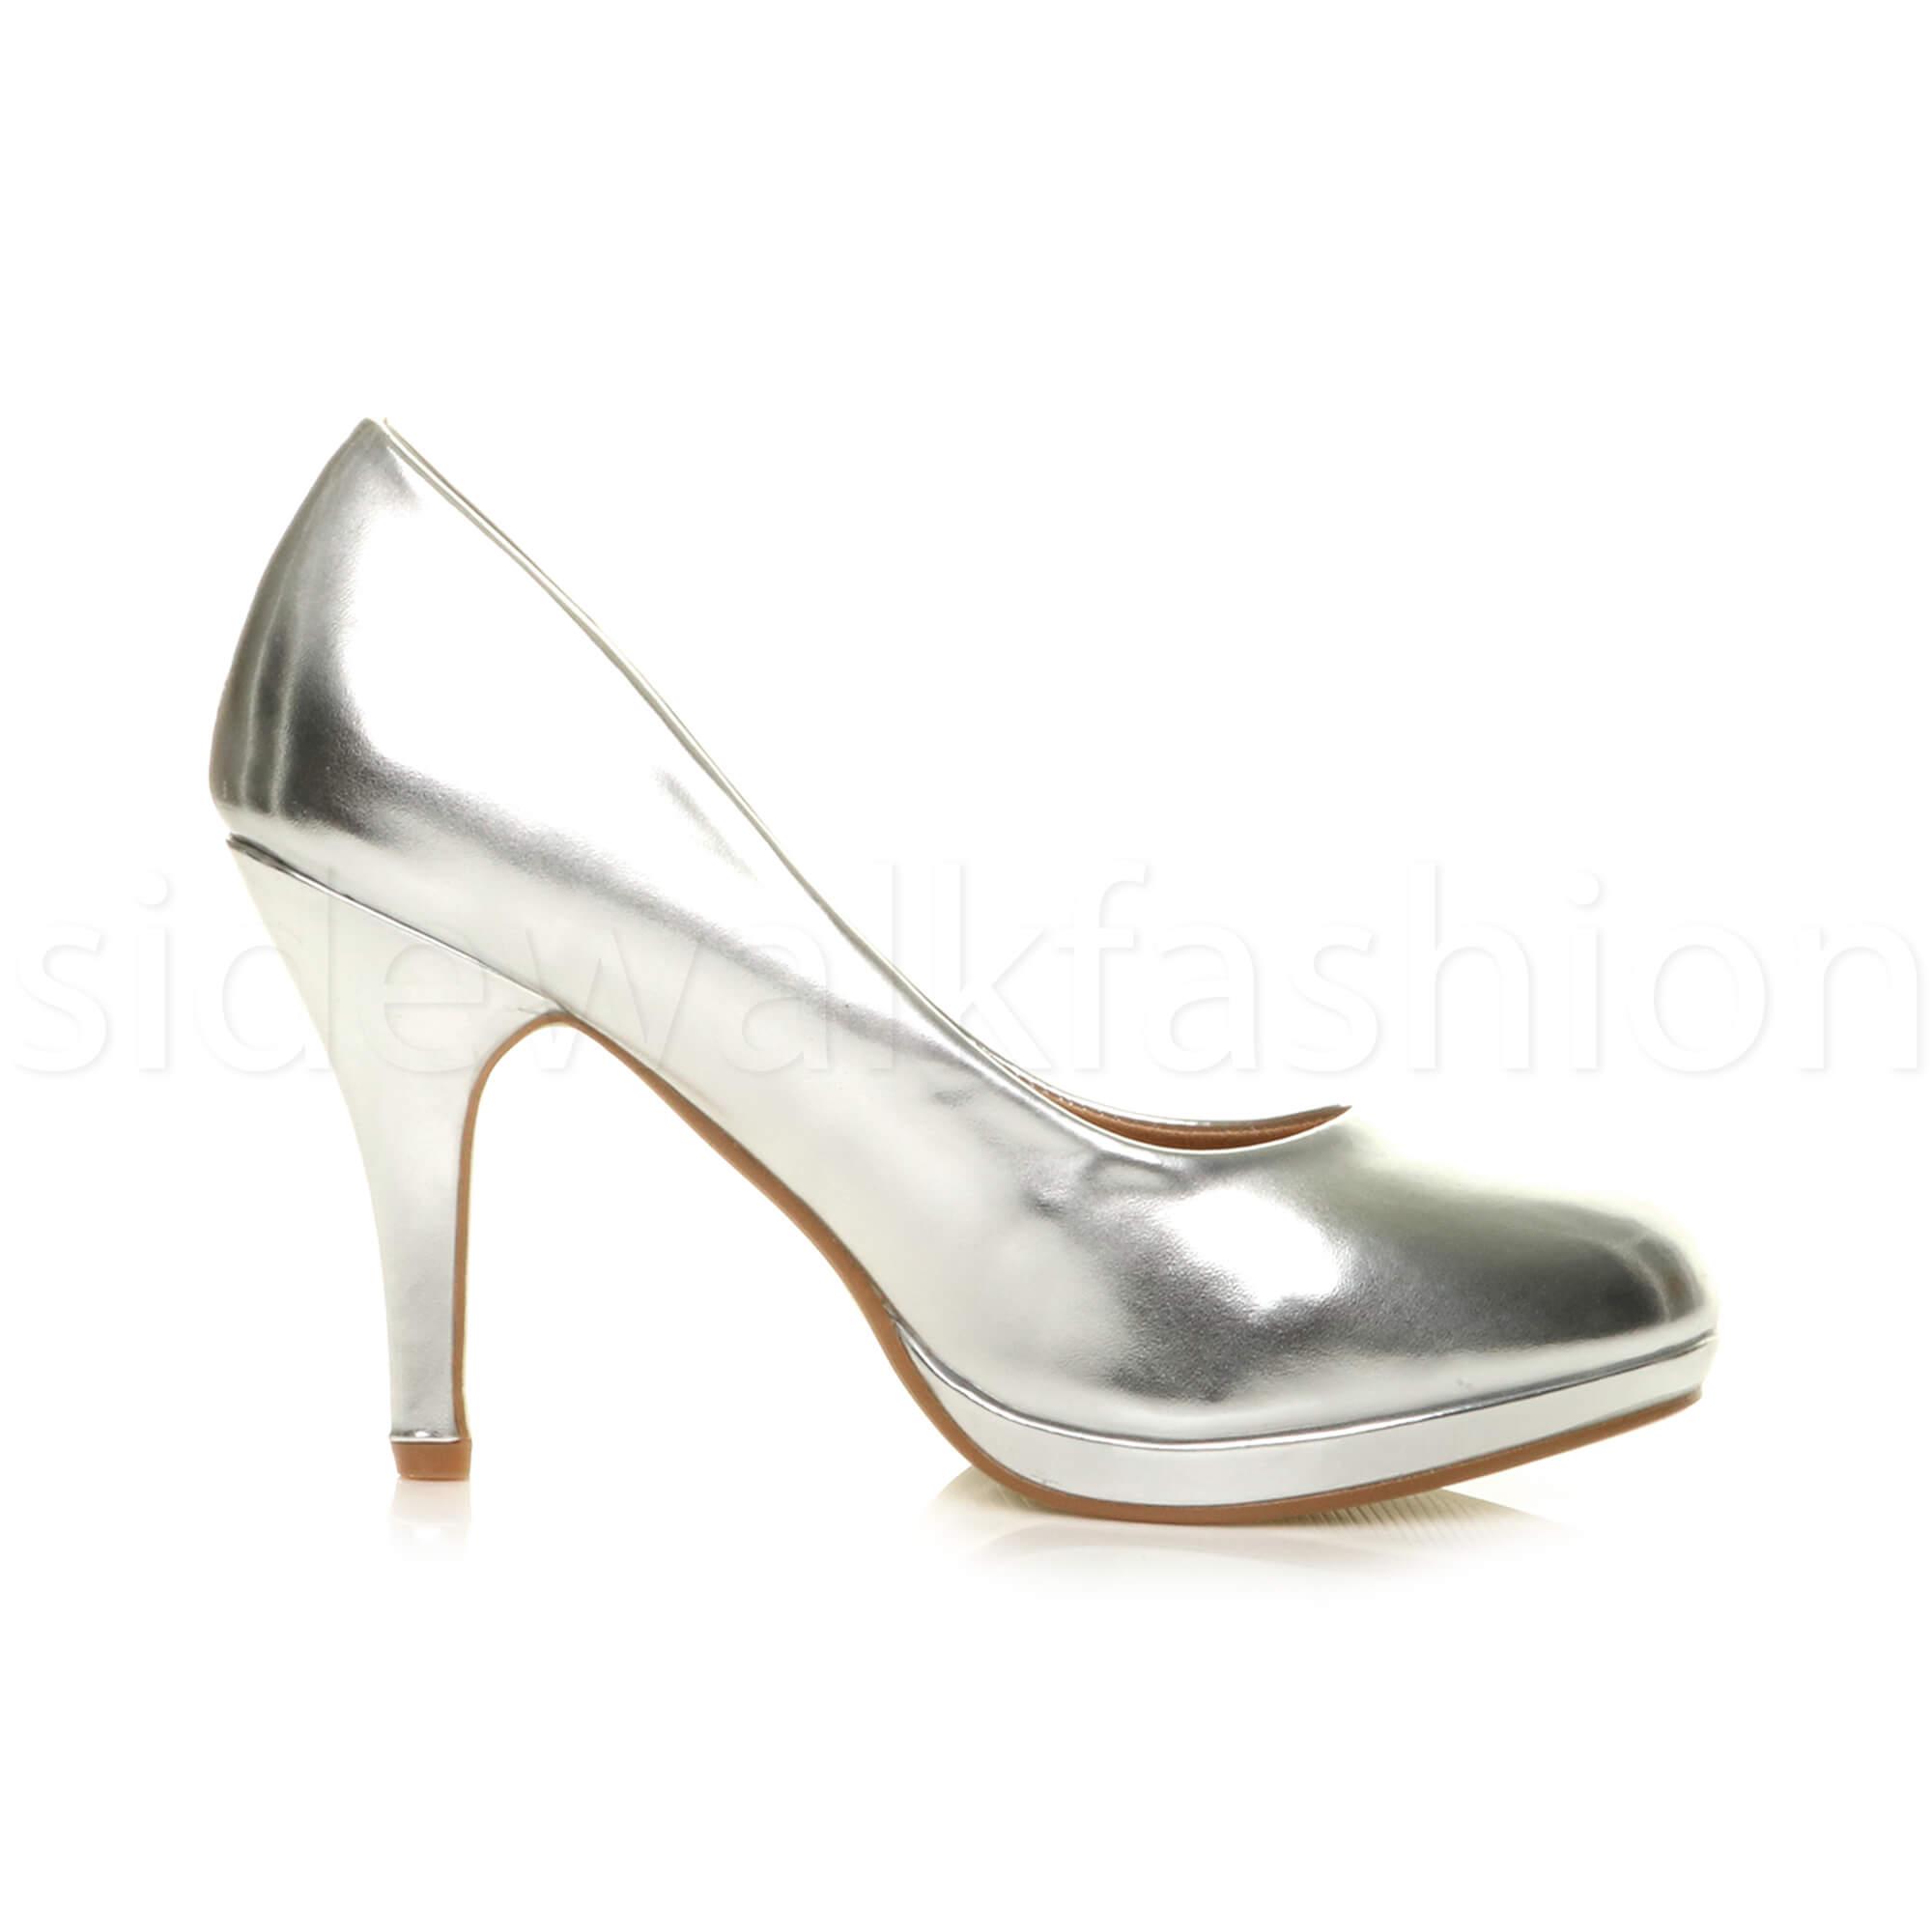 Womens-ladies-high-mid-heel-platform-wedding-evening-bridesmaid-court-shoes-size thumbnail 165